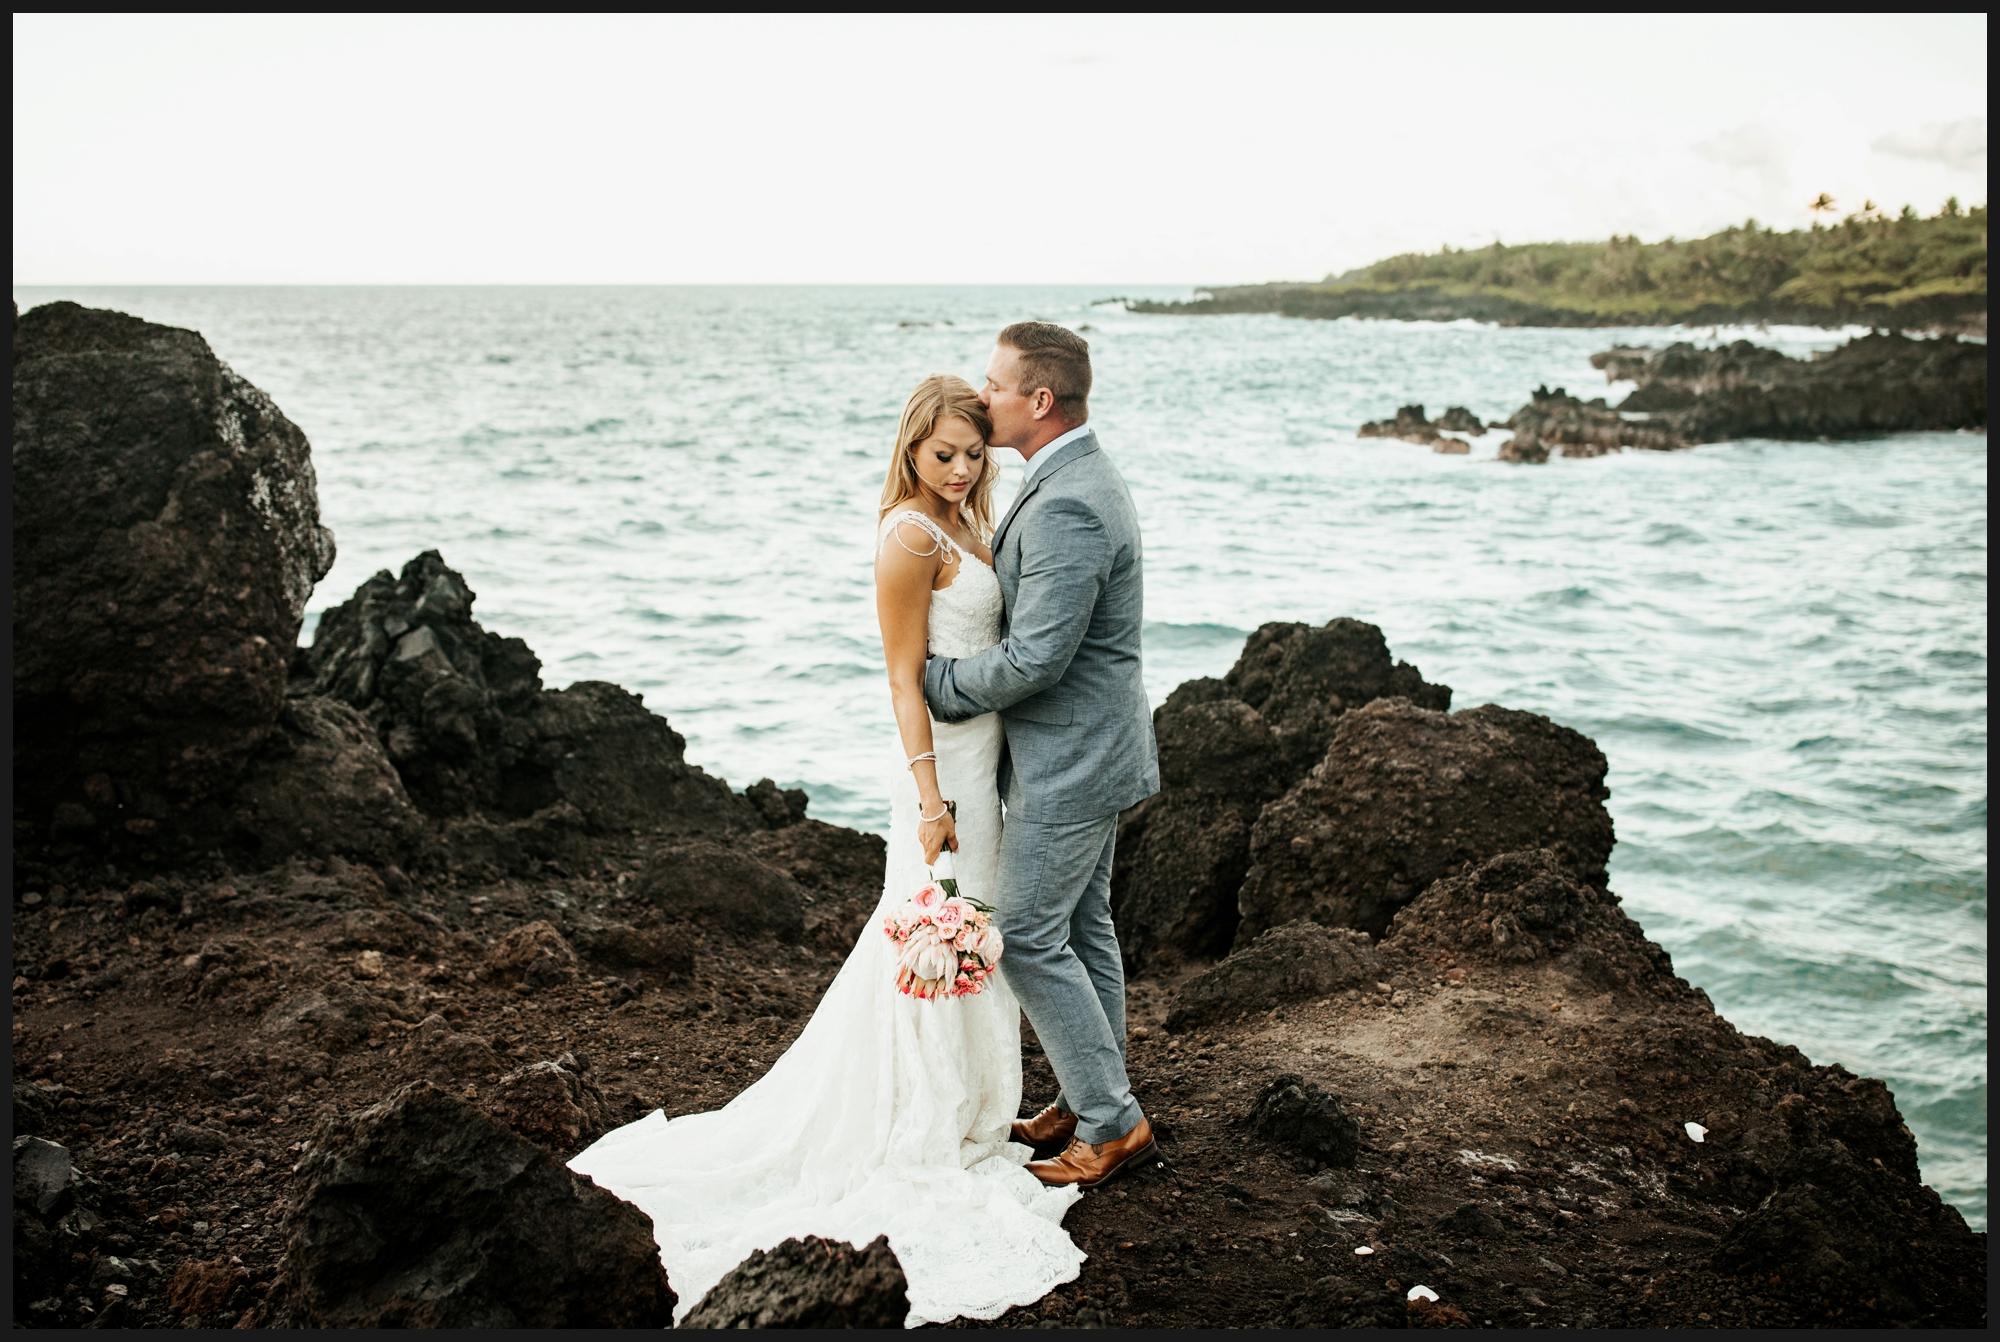 Orlando-Wedding-Photographer-destination-wedding-photographer-florida-wedding-photographer-hawaii-wedding-photographer_0024.jpg